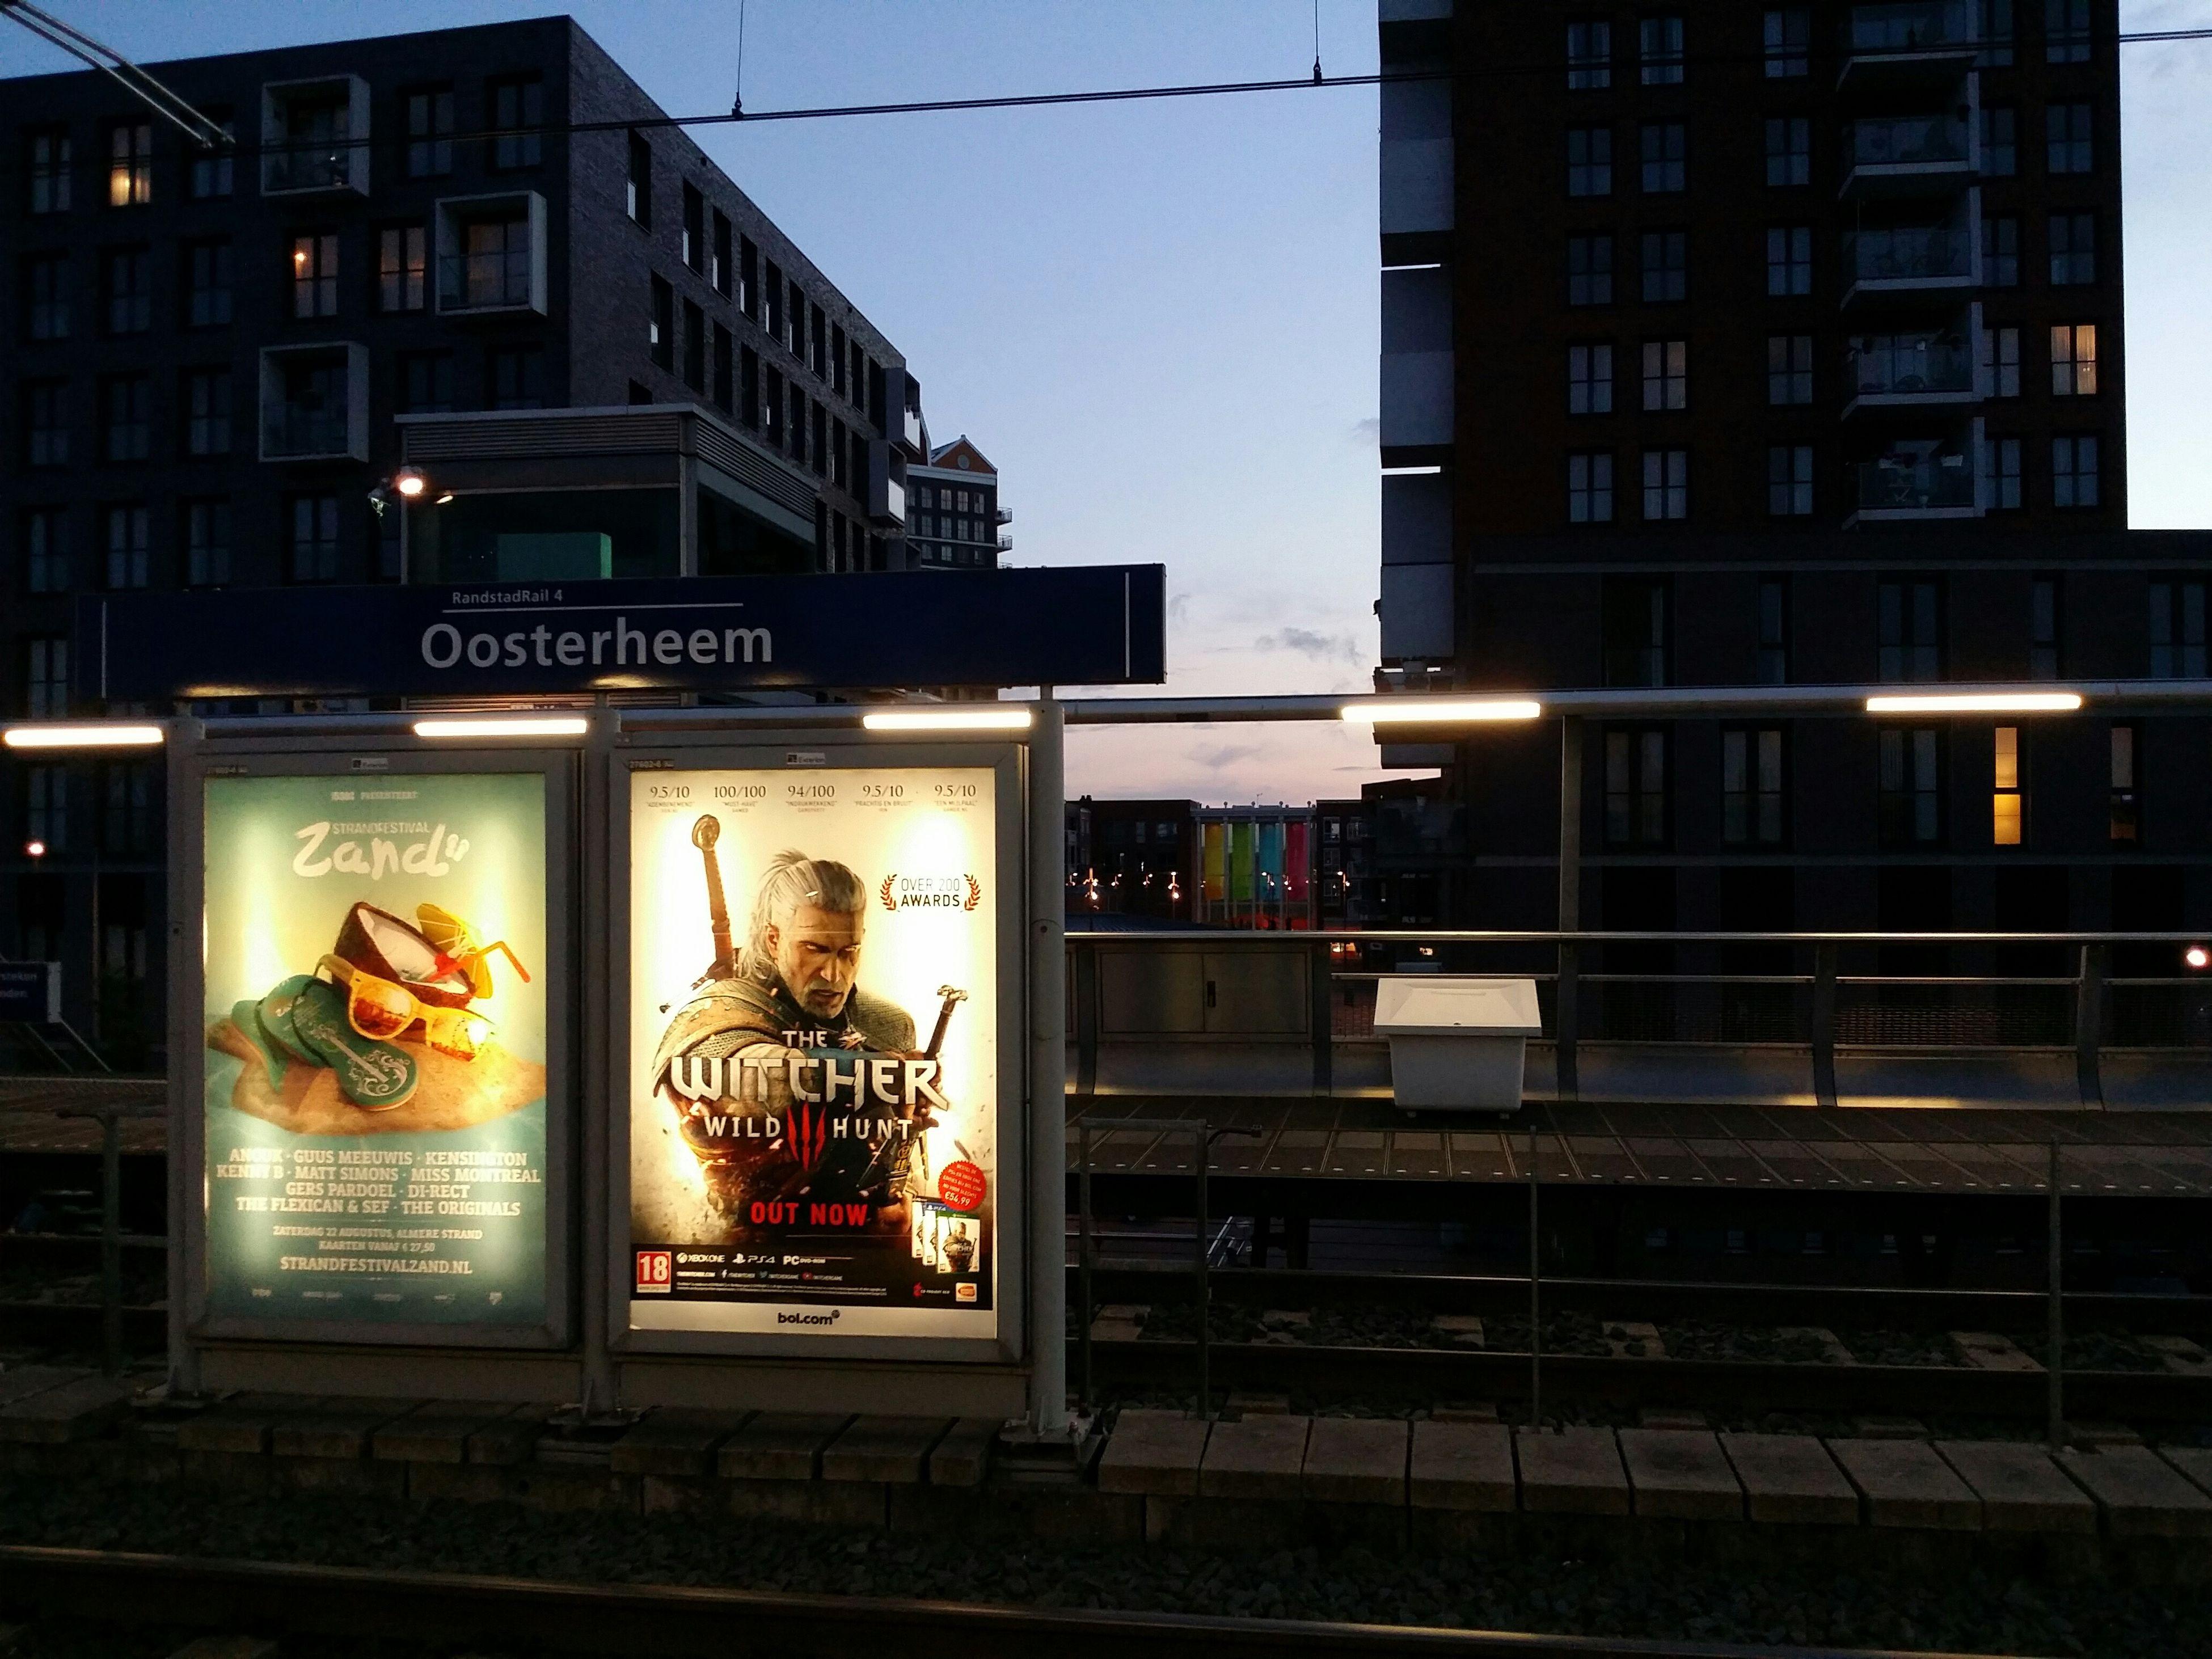 Railway Station Zoetermeer City Life